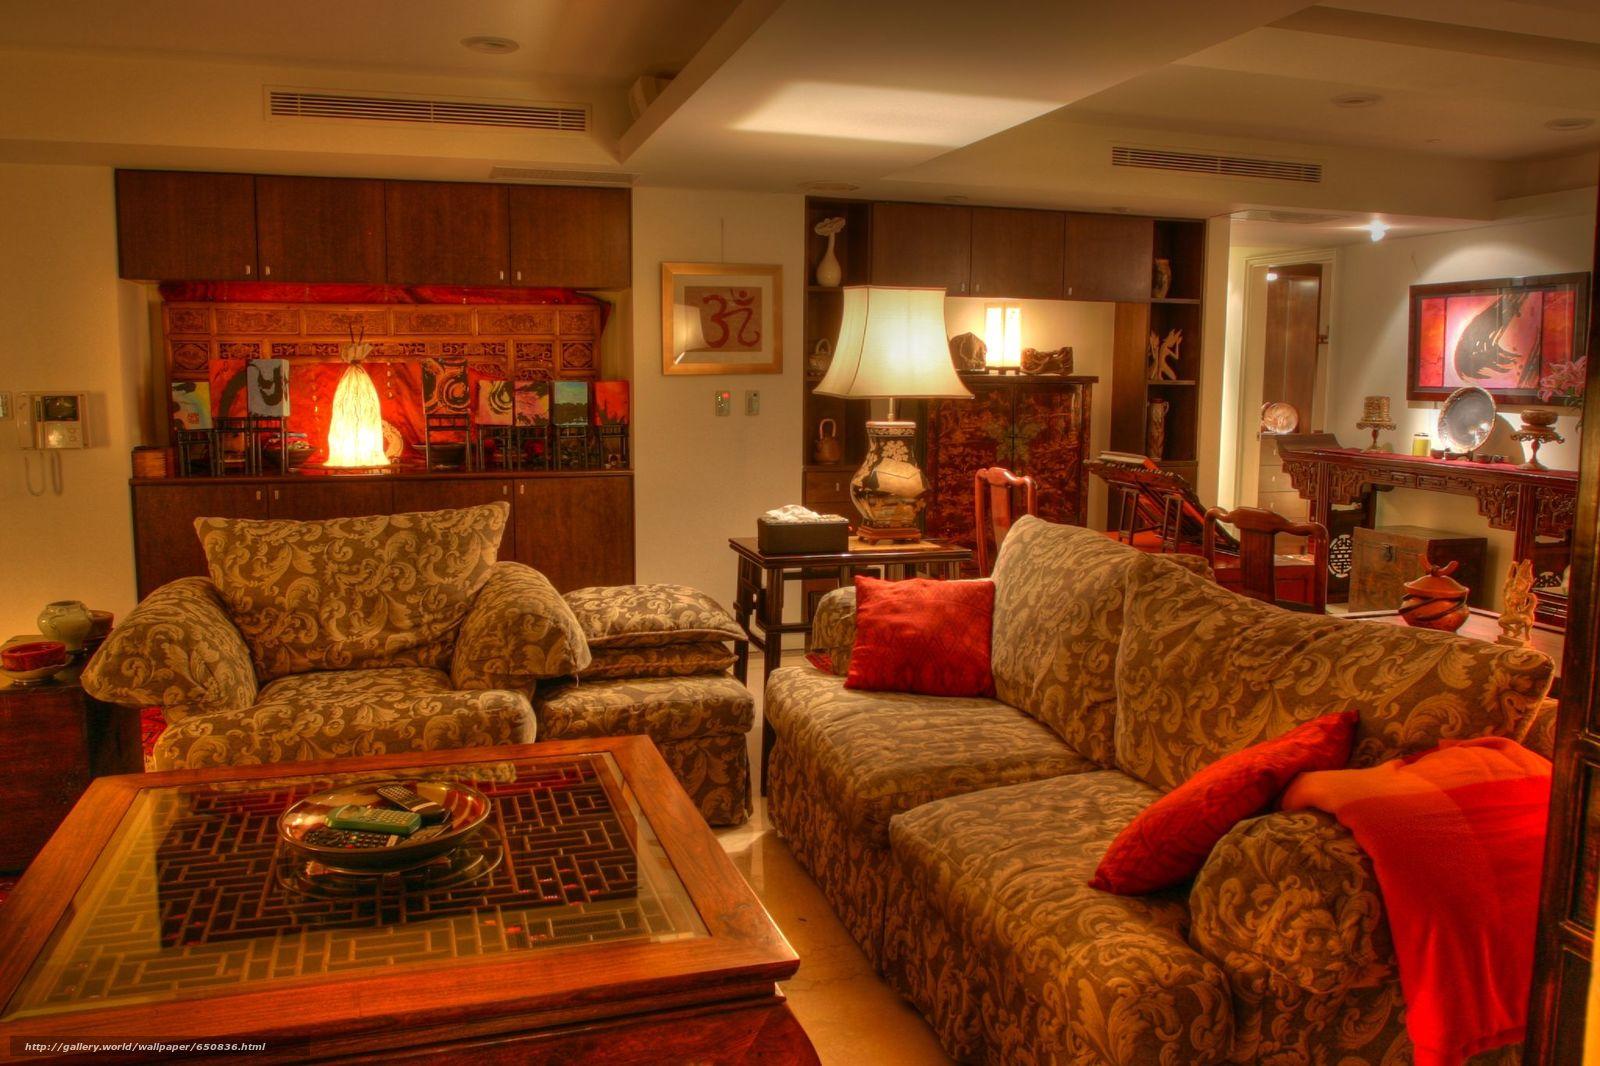 Download wallpaper interior room,  interior,  room,  furniture free desktop wallpaper in the resolution 2048x1365 — picture №650836